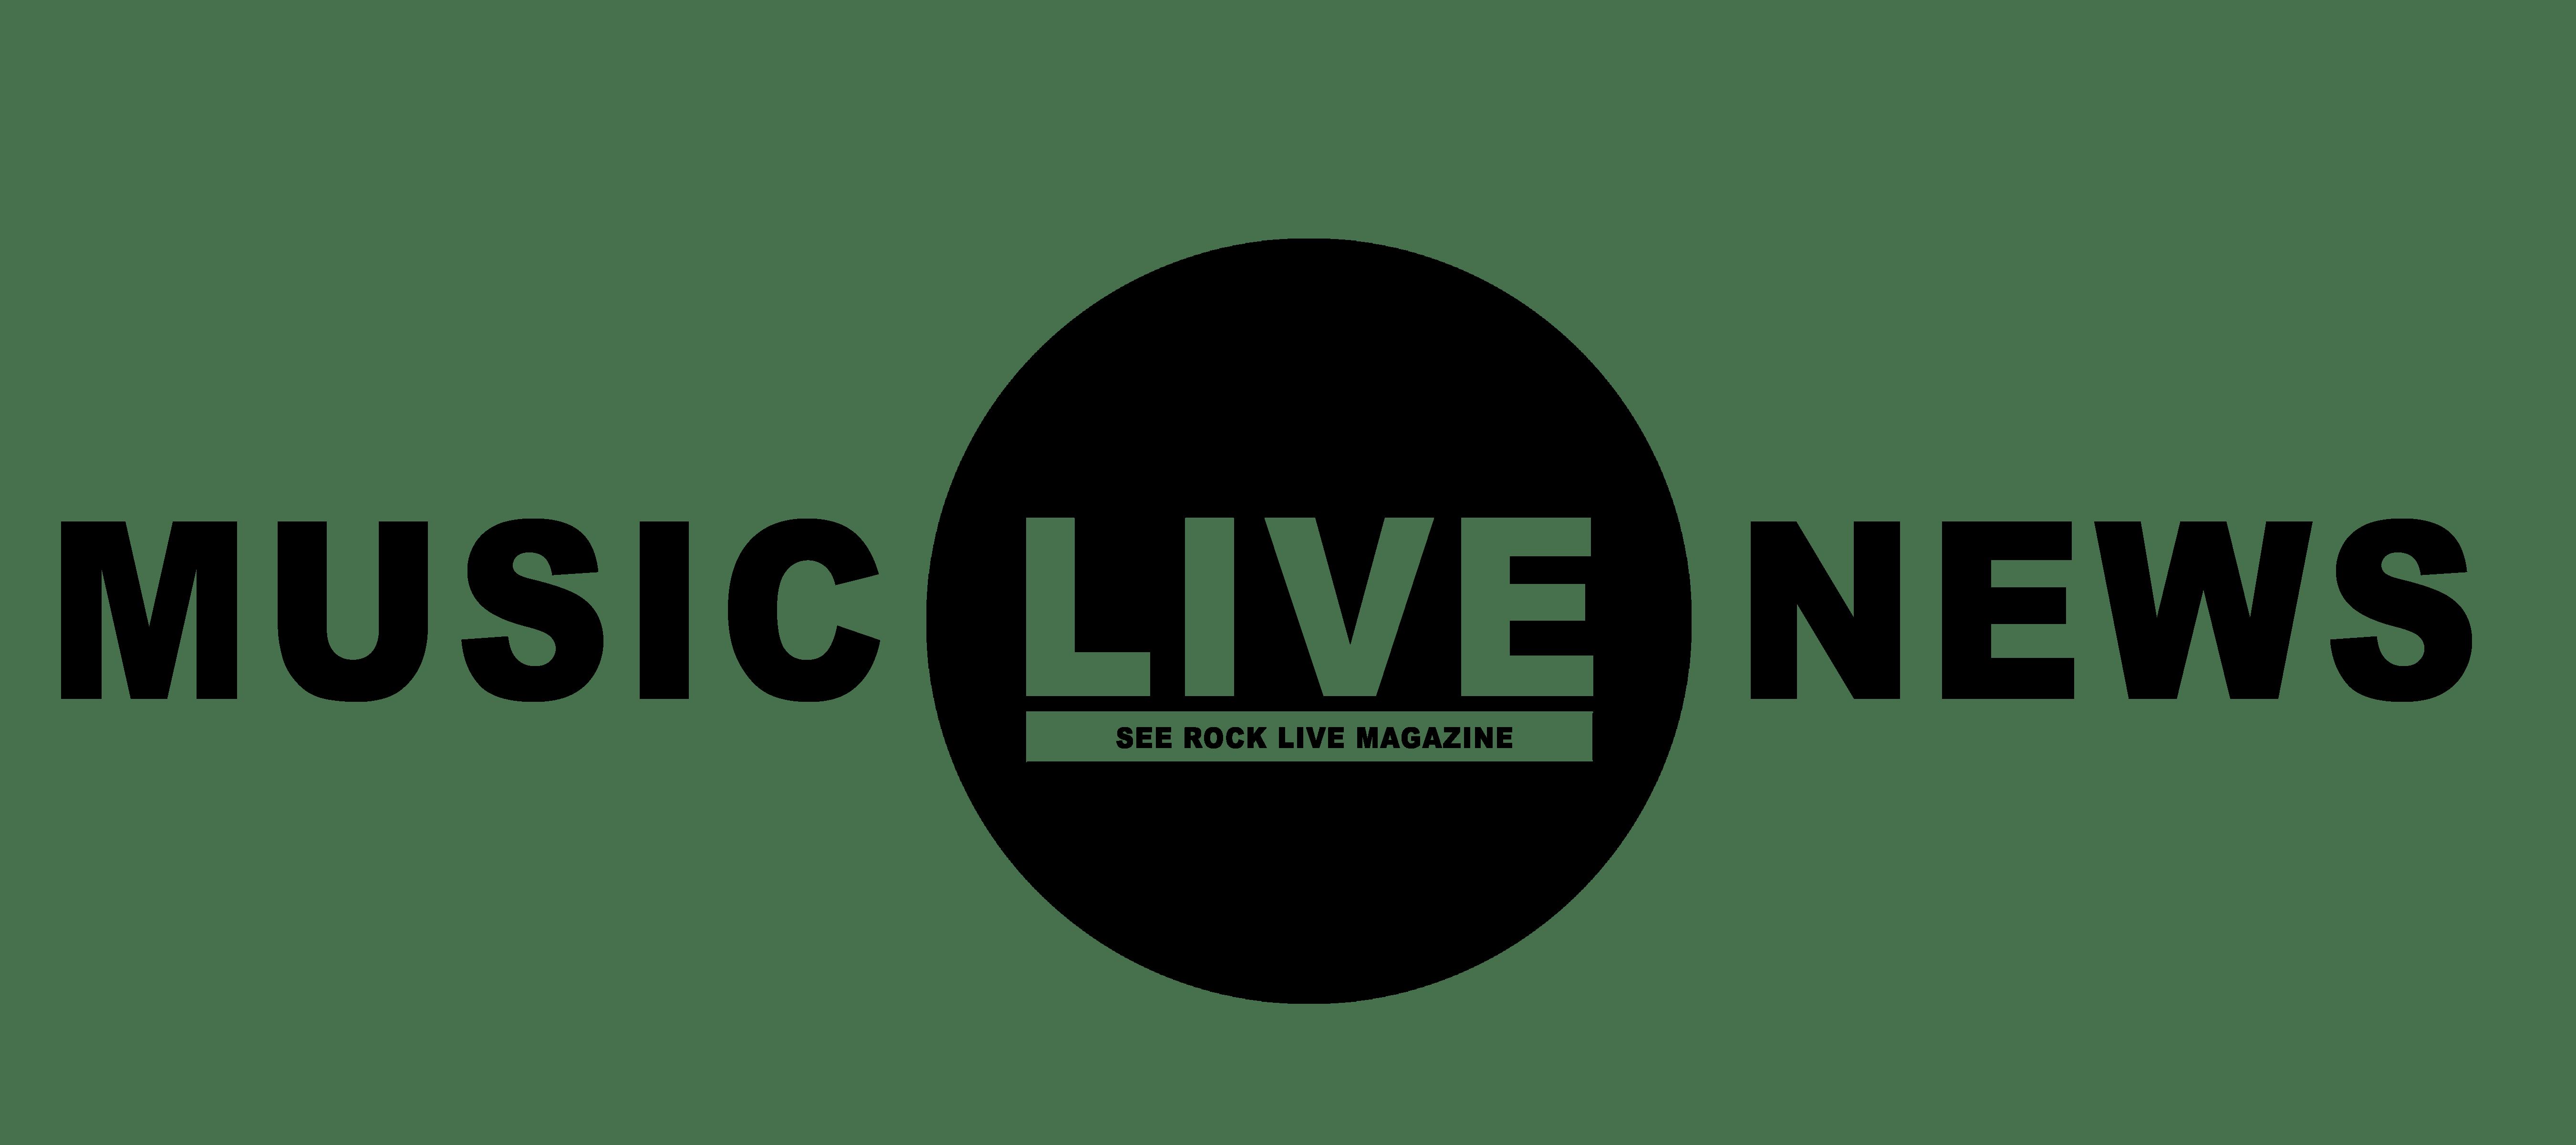 Music news Logo